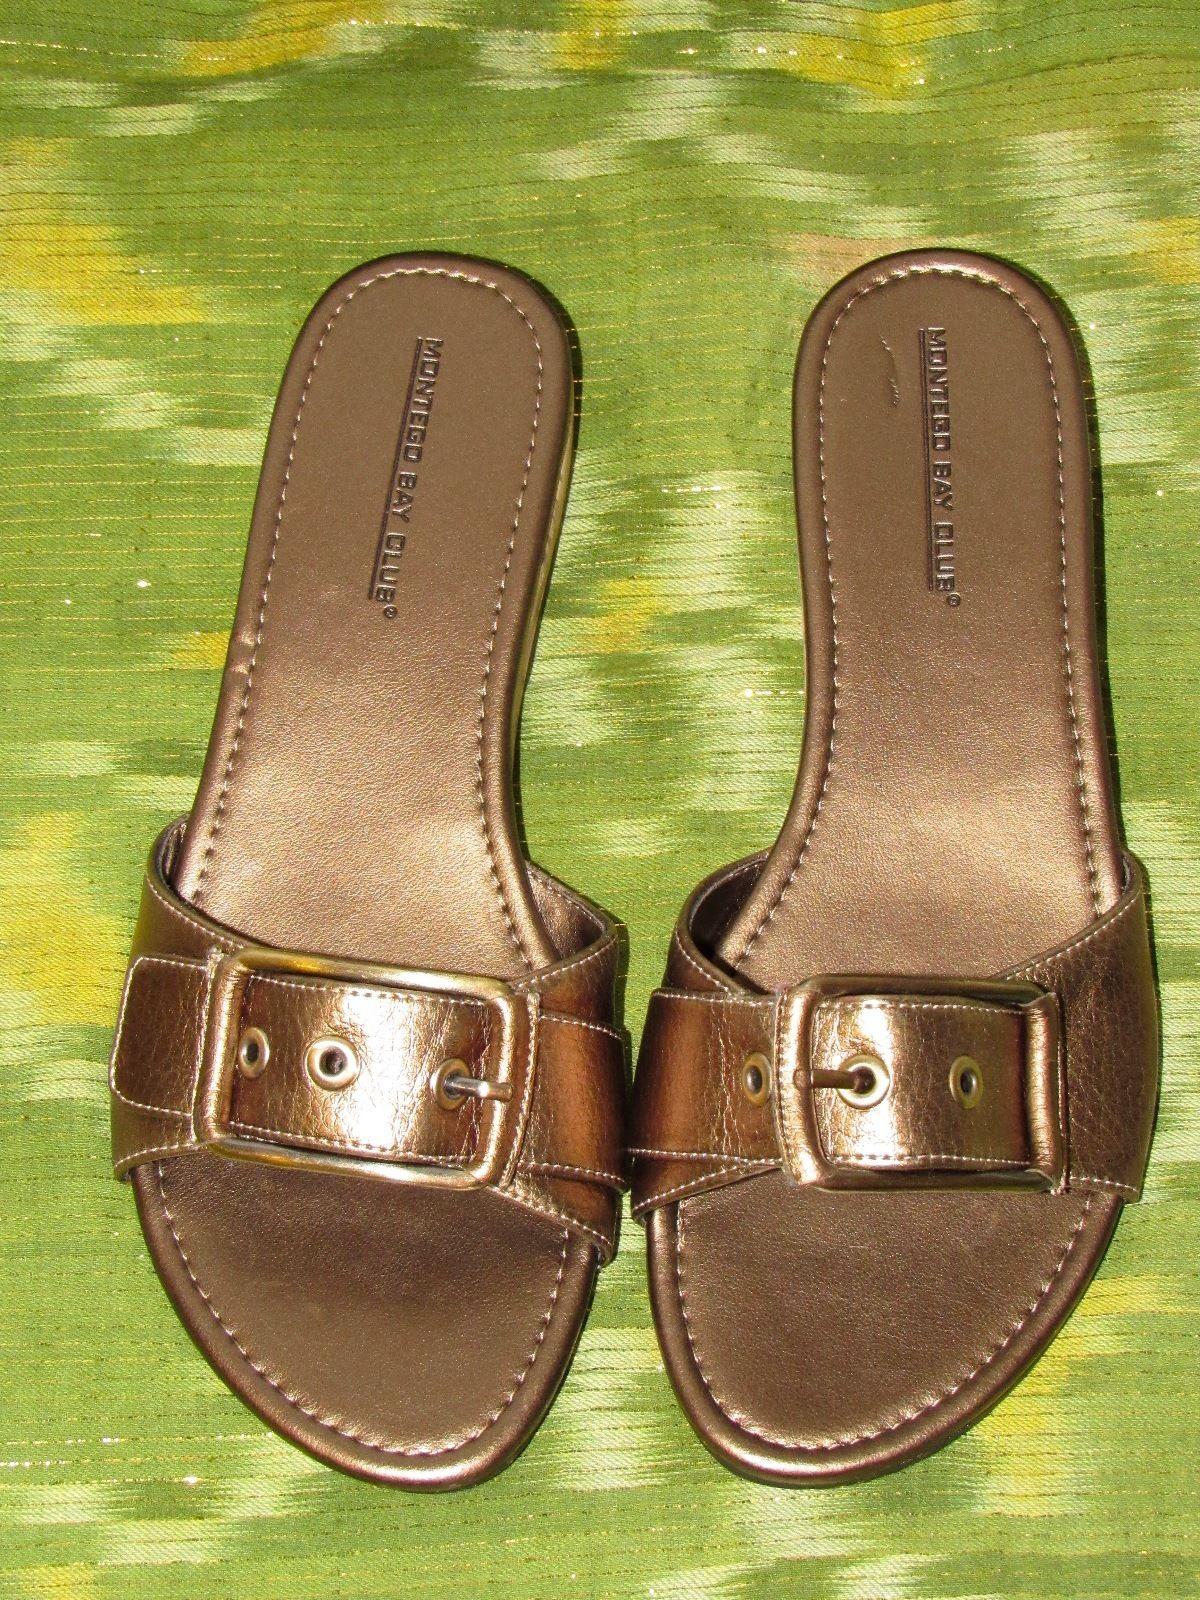 Montego Bay Club Solid Bronze Faux Leather Slides Slip On Buckle Sandal Low 7 M